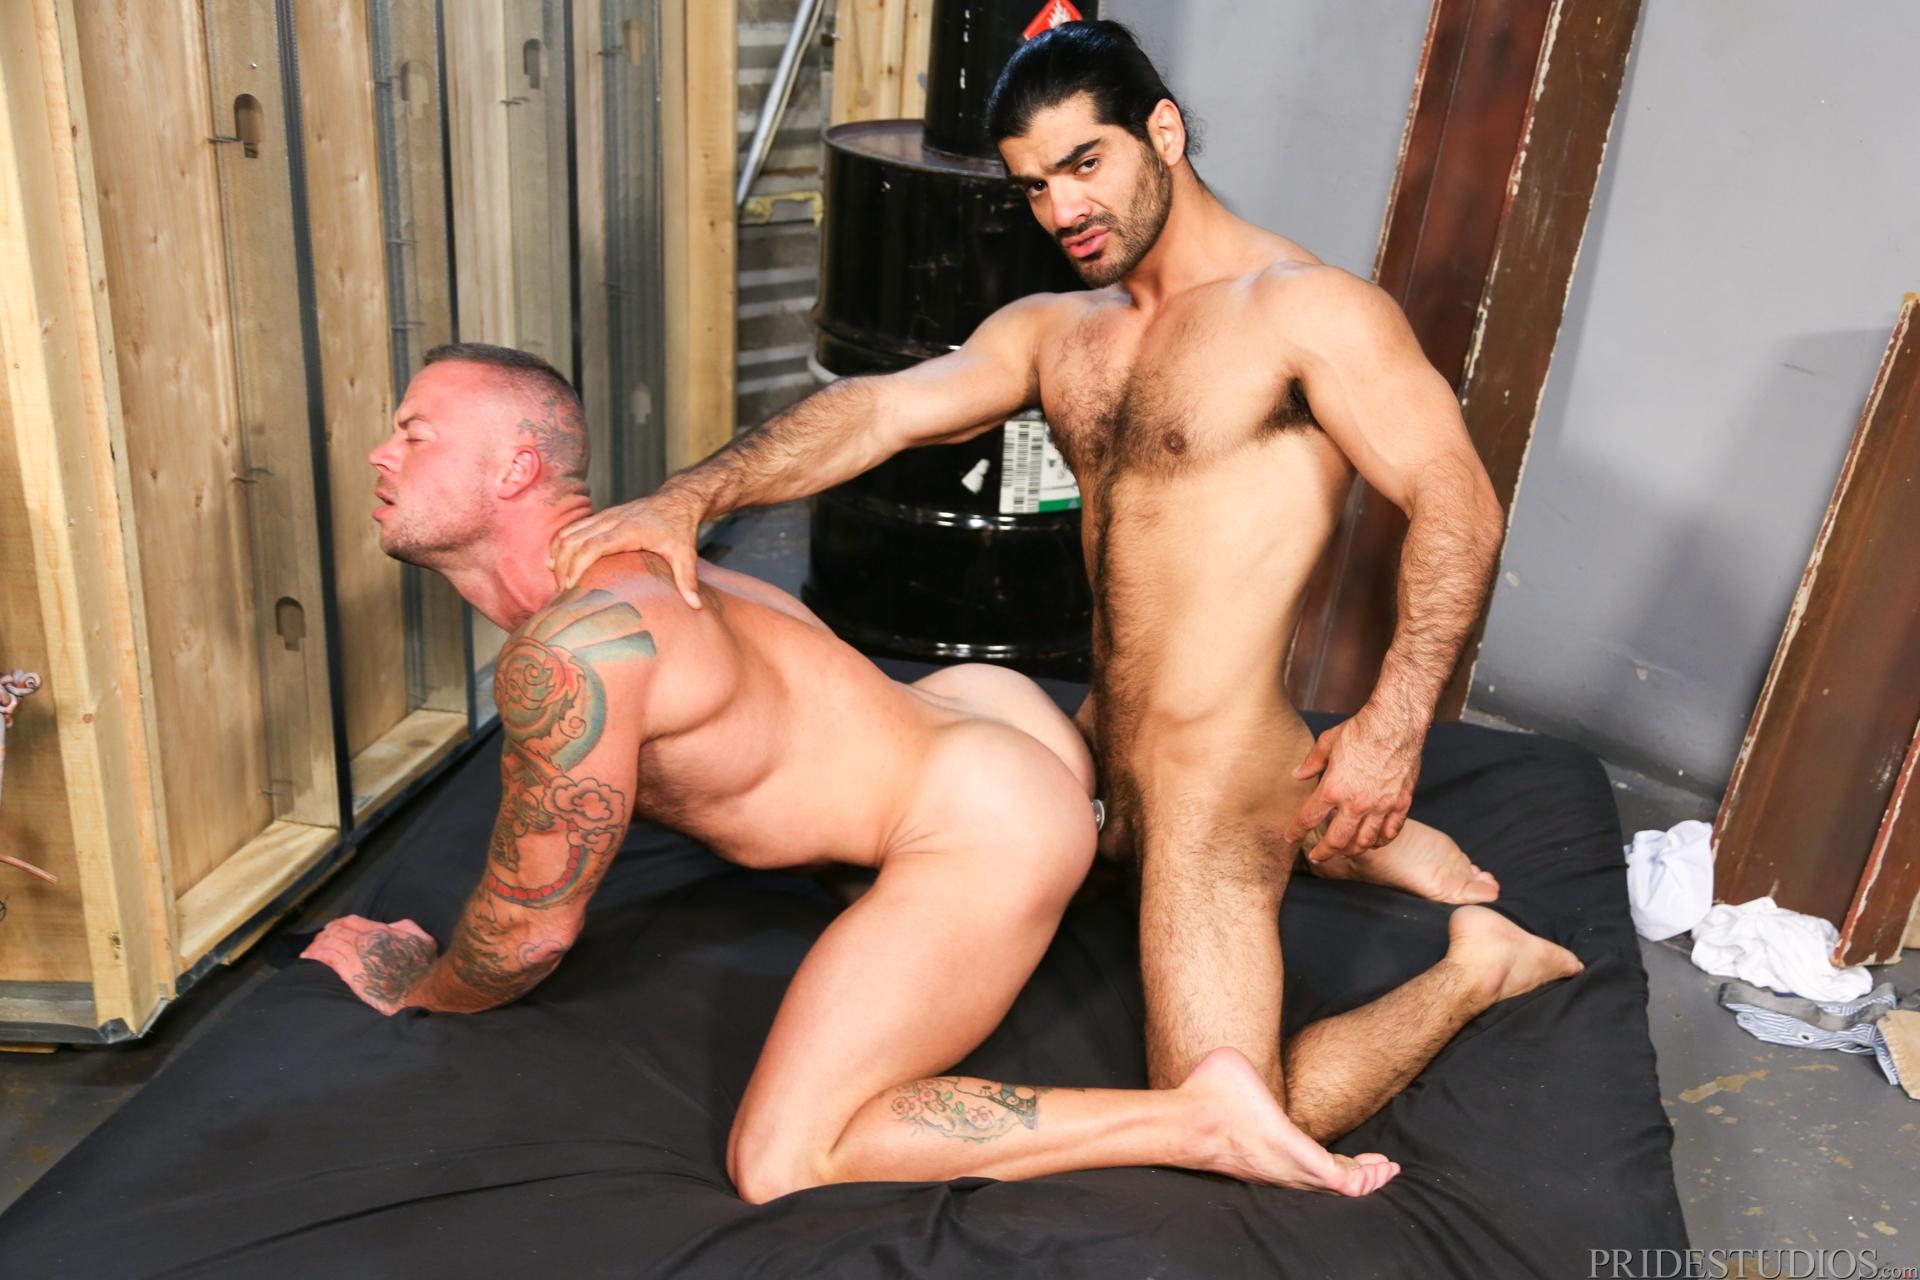 Austin Wolf Straight Porn gay porn news: mario romo, skyy knox, austin wolf, dante